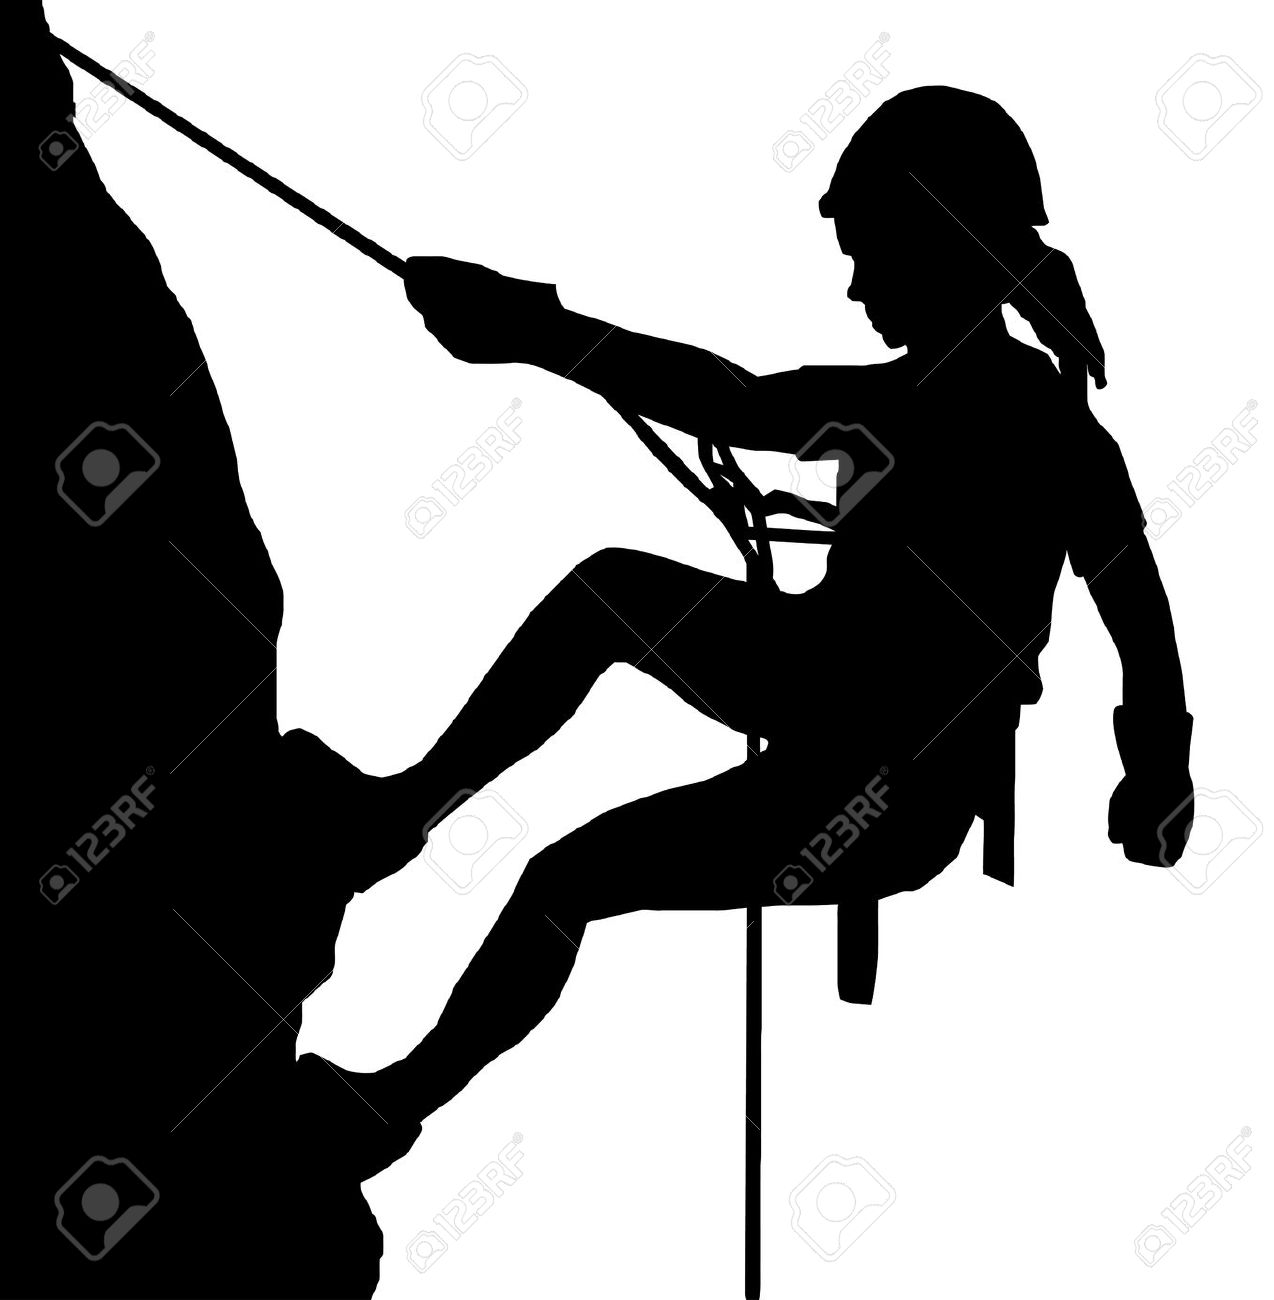 Rock climbing clipart free - ClipartFest